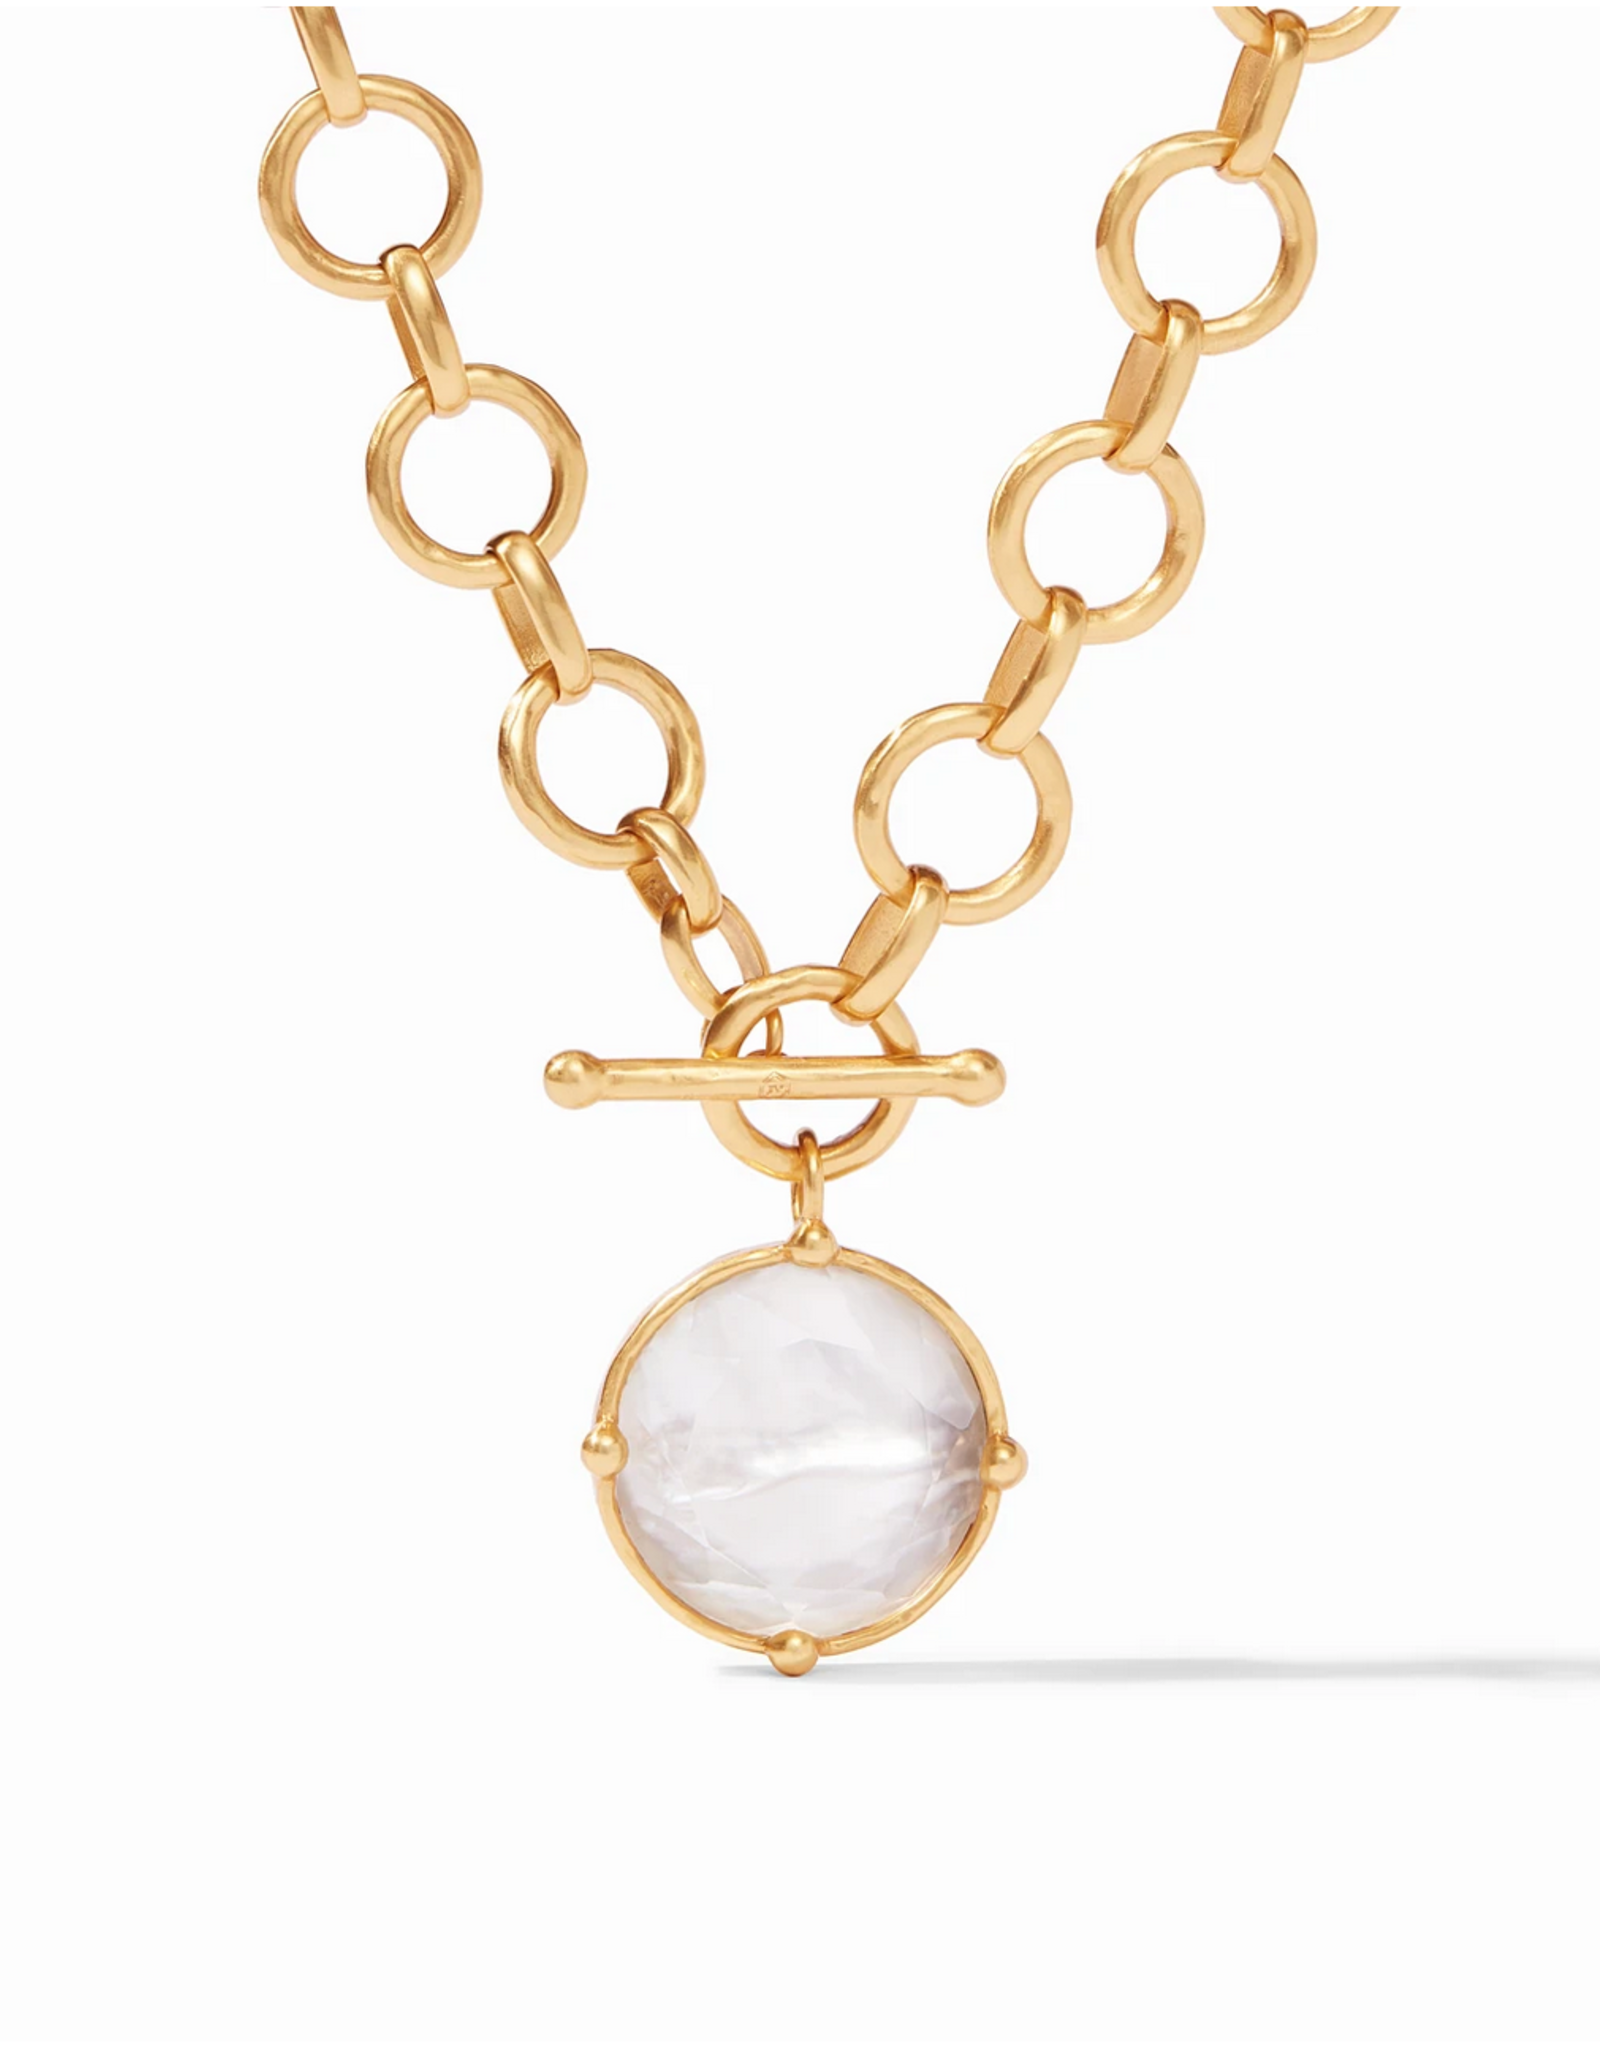 Website Honeybee Statement Necklace - iridescent clear crystal